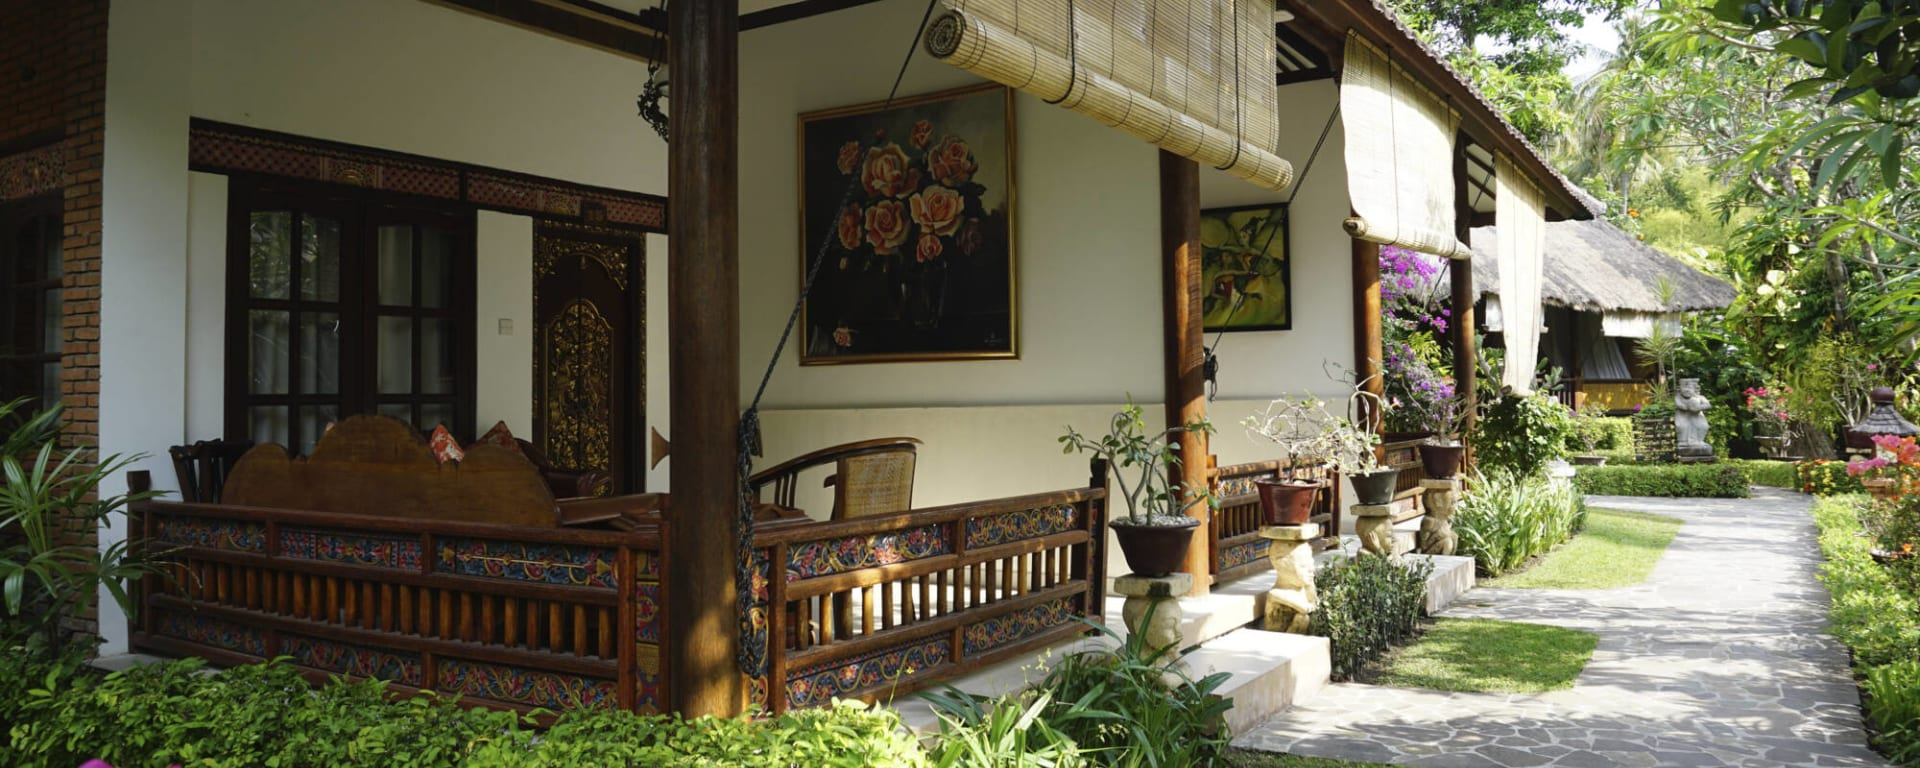 Puri Mas Beach Resort in Lombok: Lombok Puri Mas Reach Resort Quirky Garten Zimmer